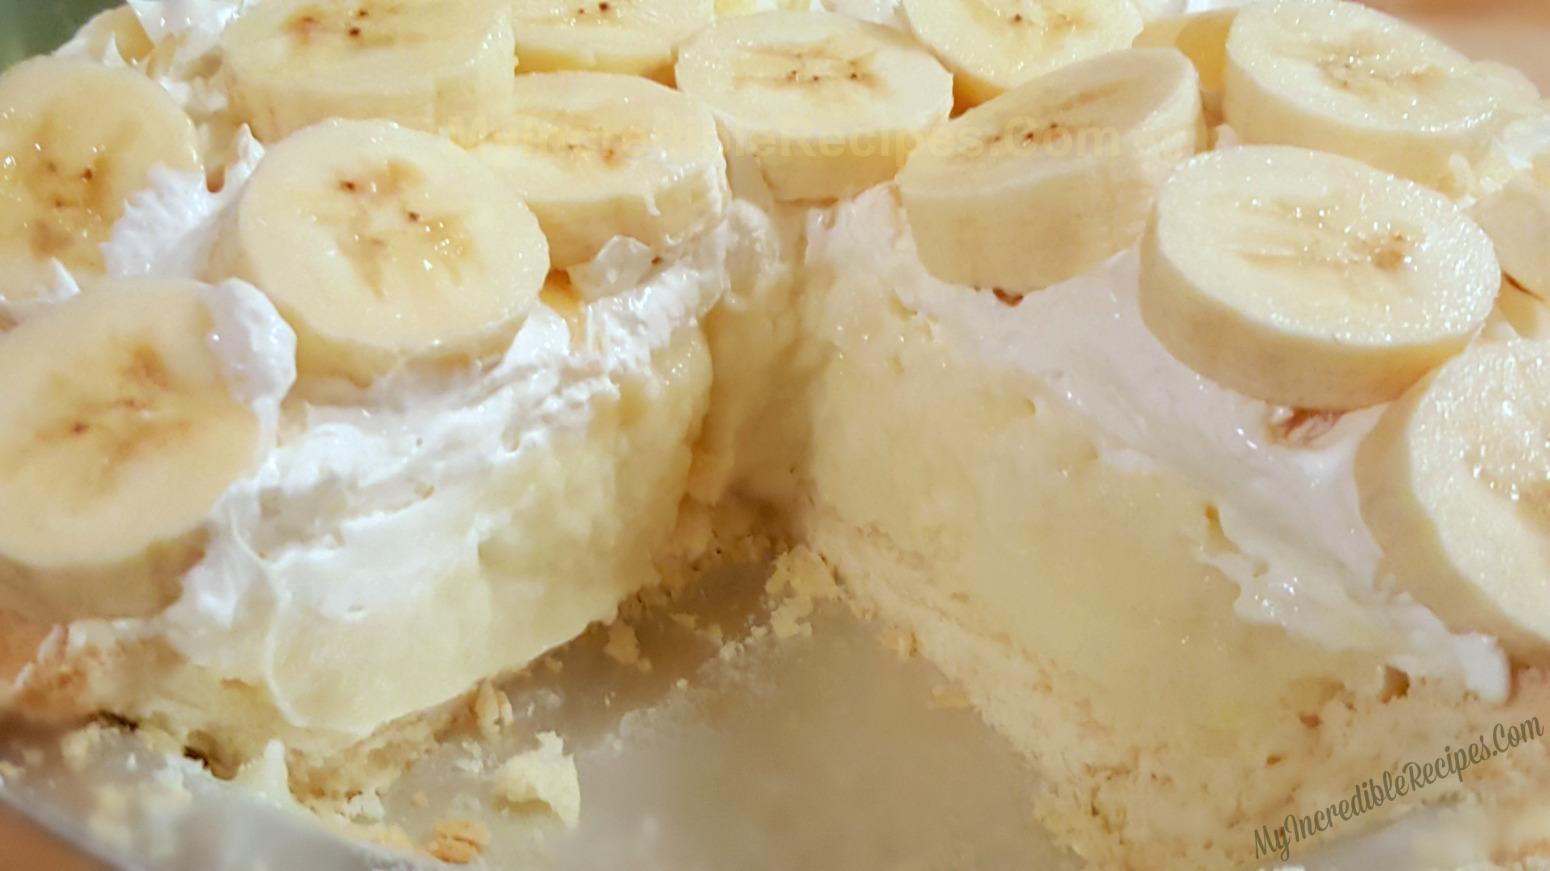 Old Fashioned Banana Cream Pie Recipe 9 Just A Pinch Recipes